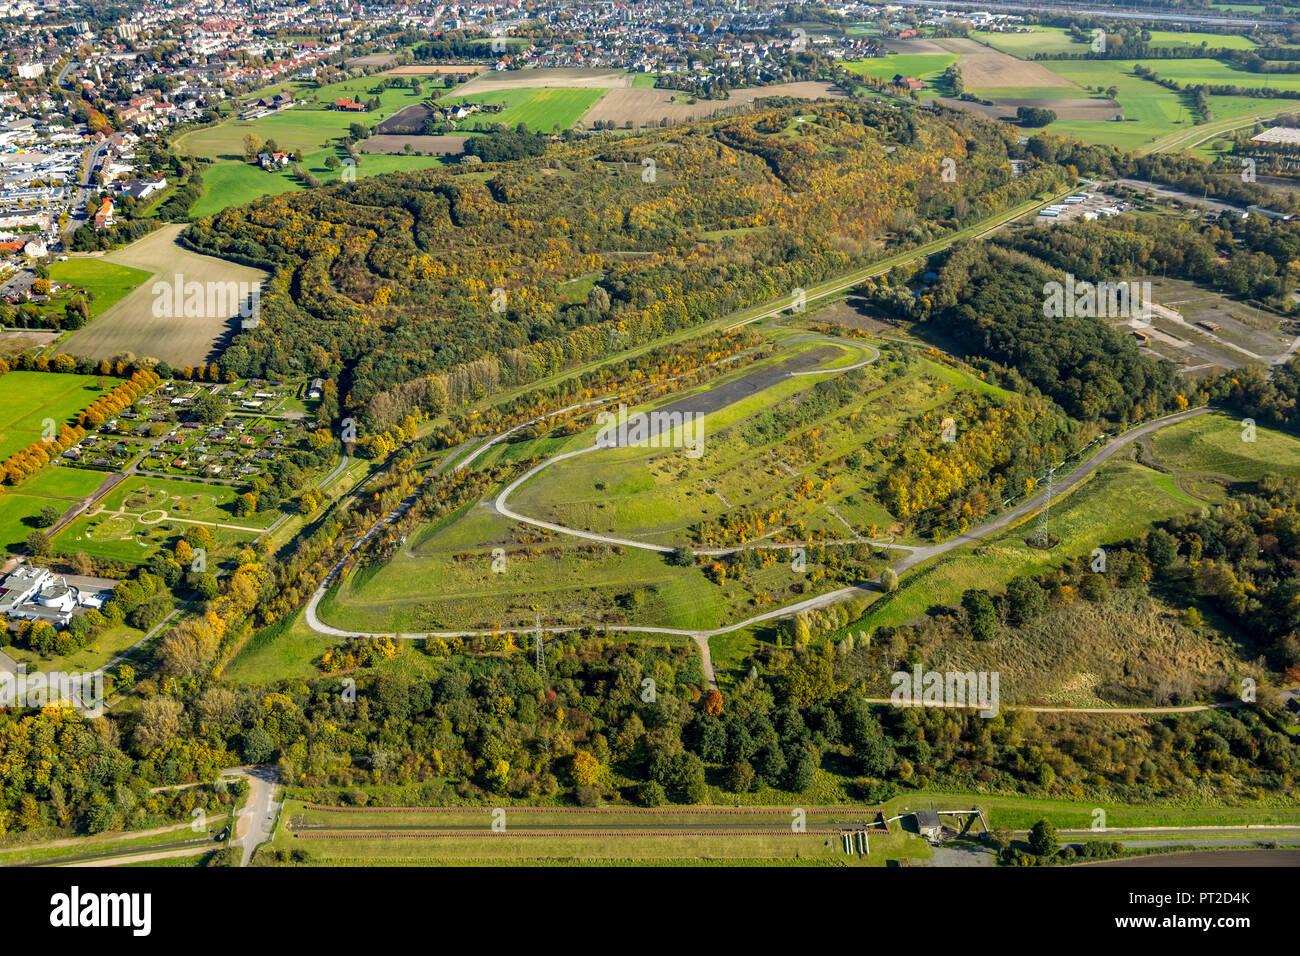 Herringen, tip Kissinger Höhe, verderben Tipp, Hamm, Ruhrgebiet, Nordrhein-Westfalen, Deutschland Stockbild